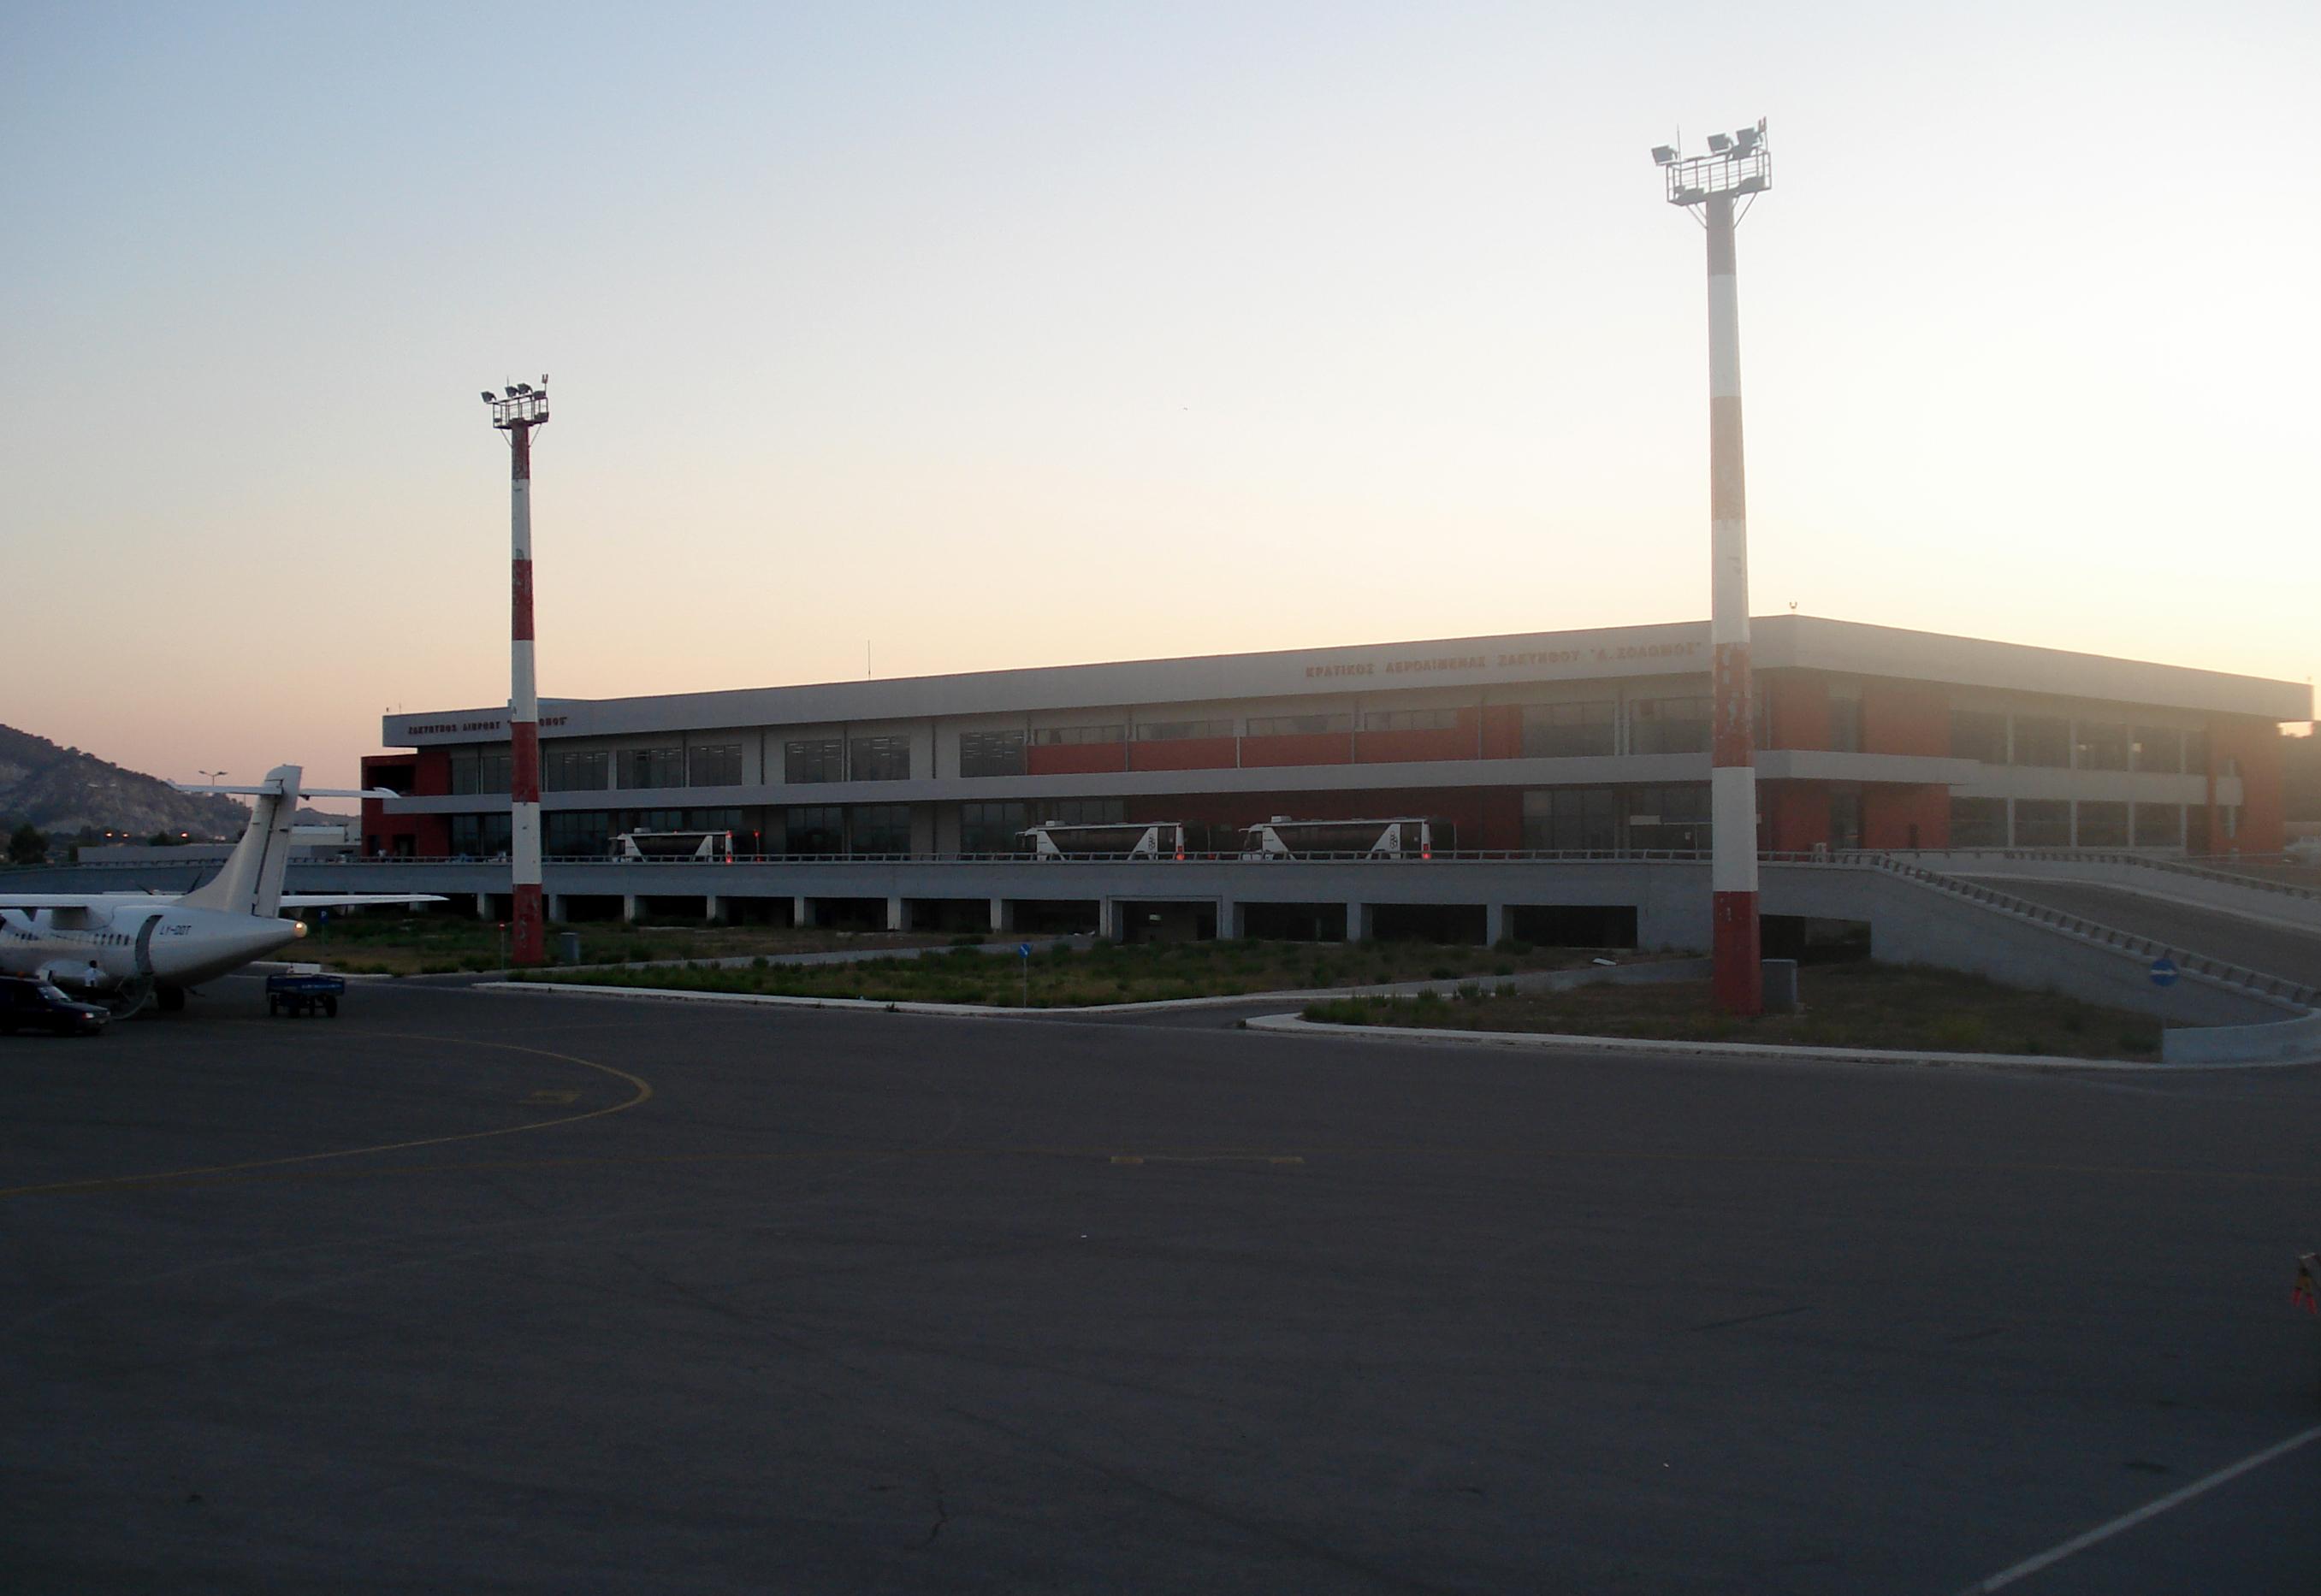 Mednarodno letališče D. Solomos, Zakintos